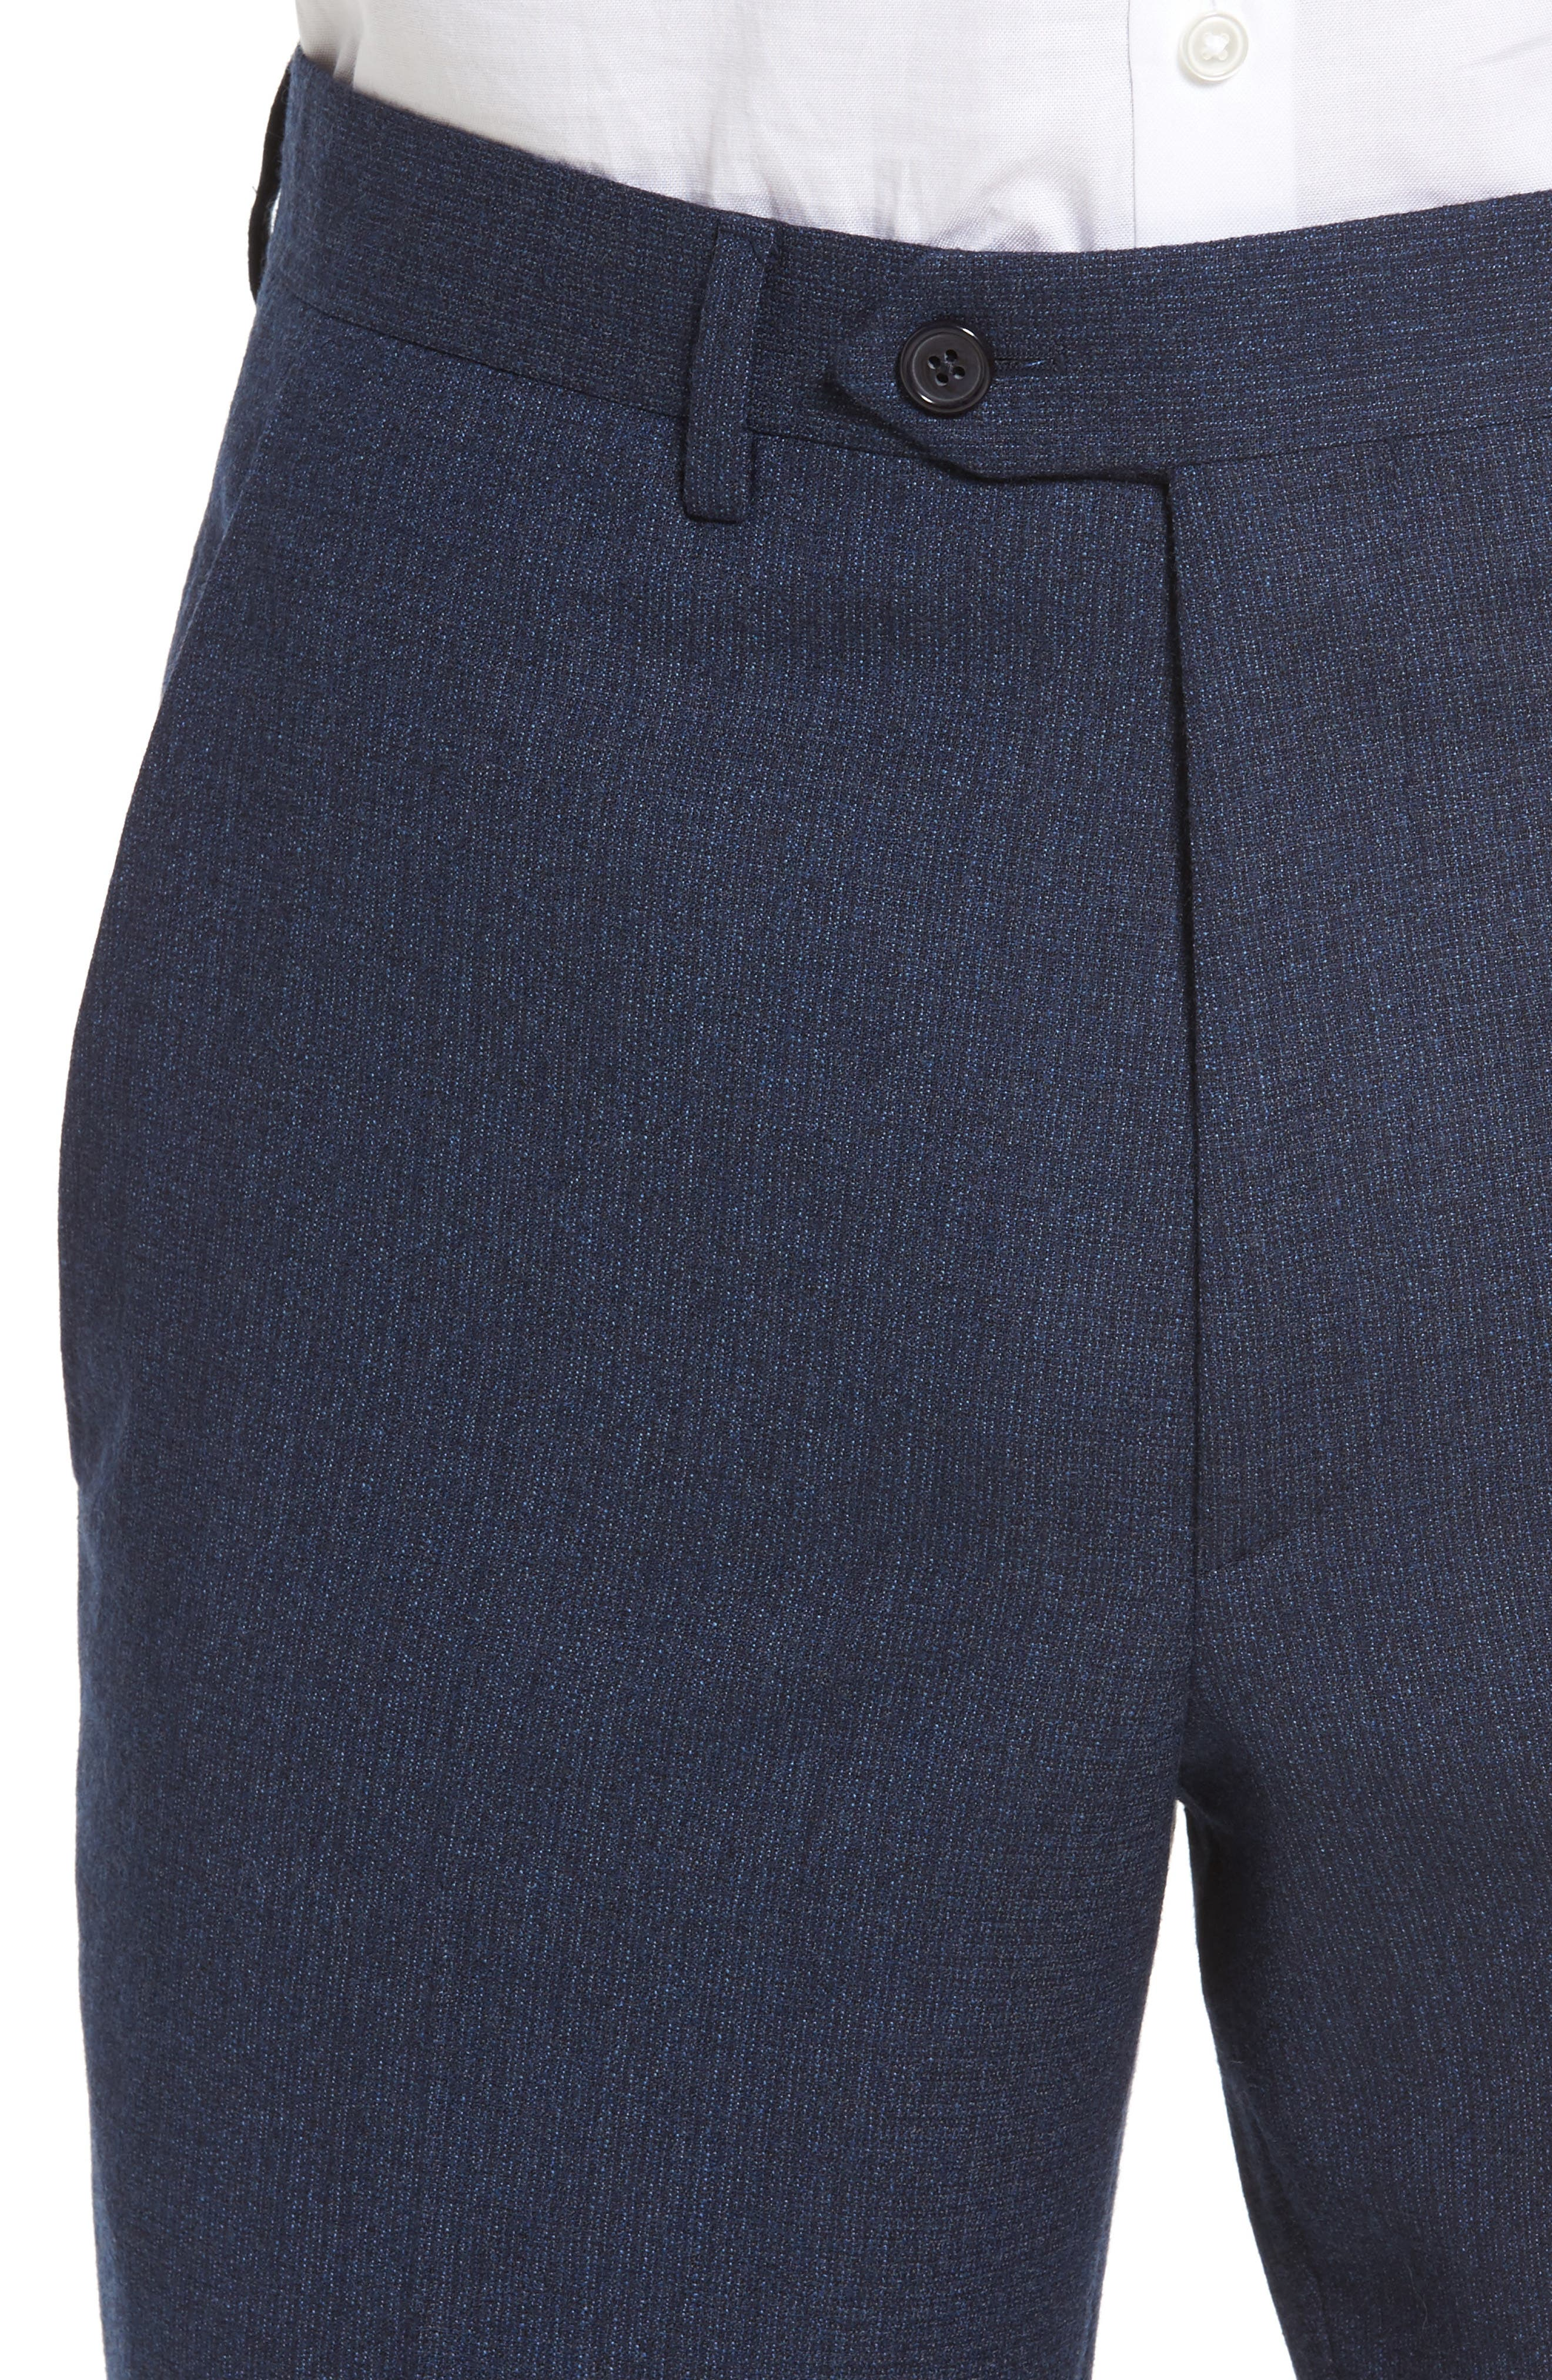 Alternate Image 4  - Santorelli Romero Regular Fit Flat Front Trousers